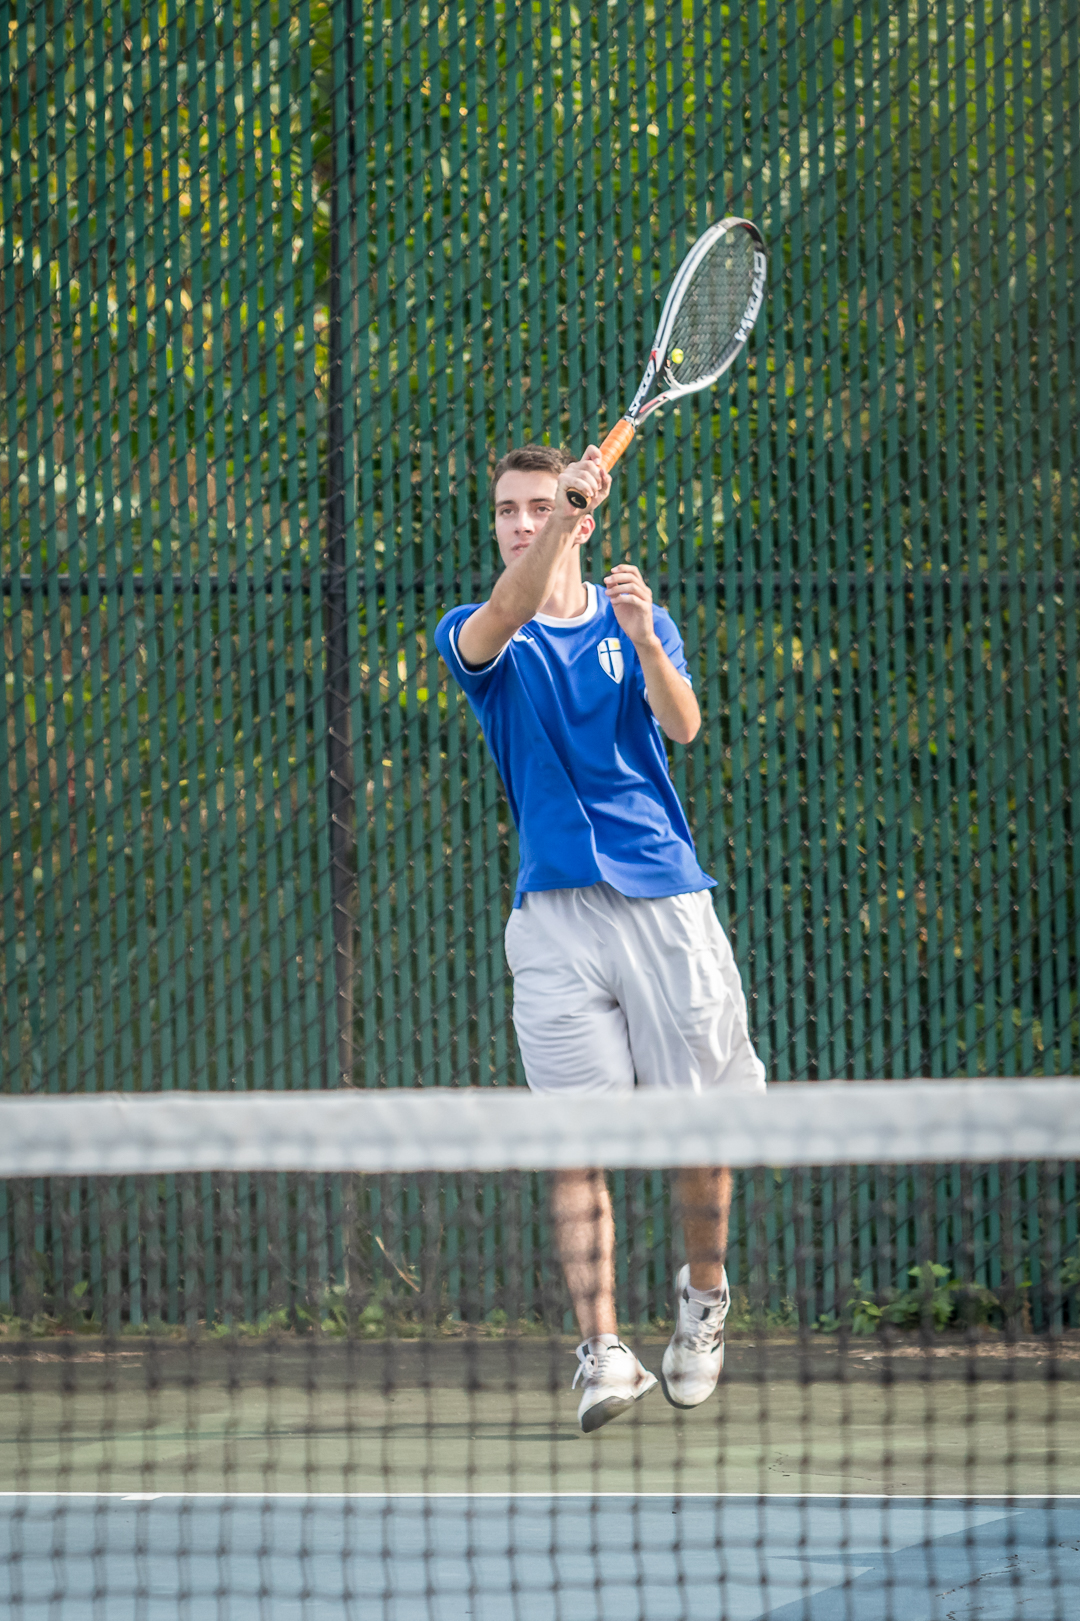 Marian-Boys-Tennis-1642.jpg